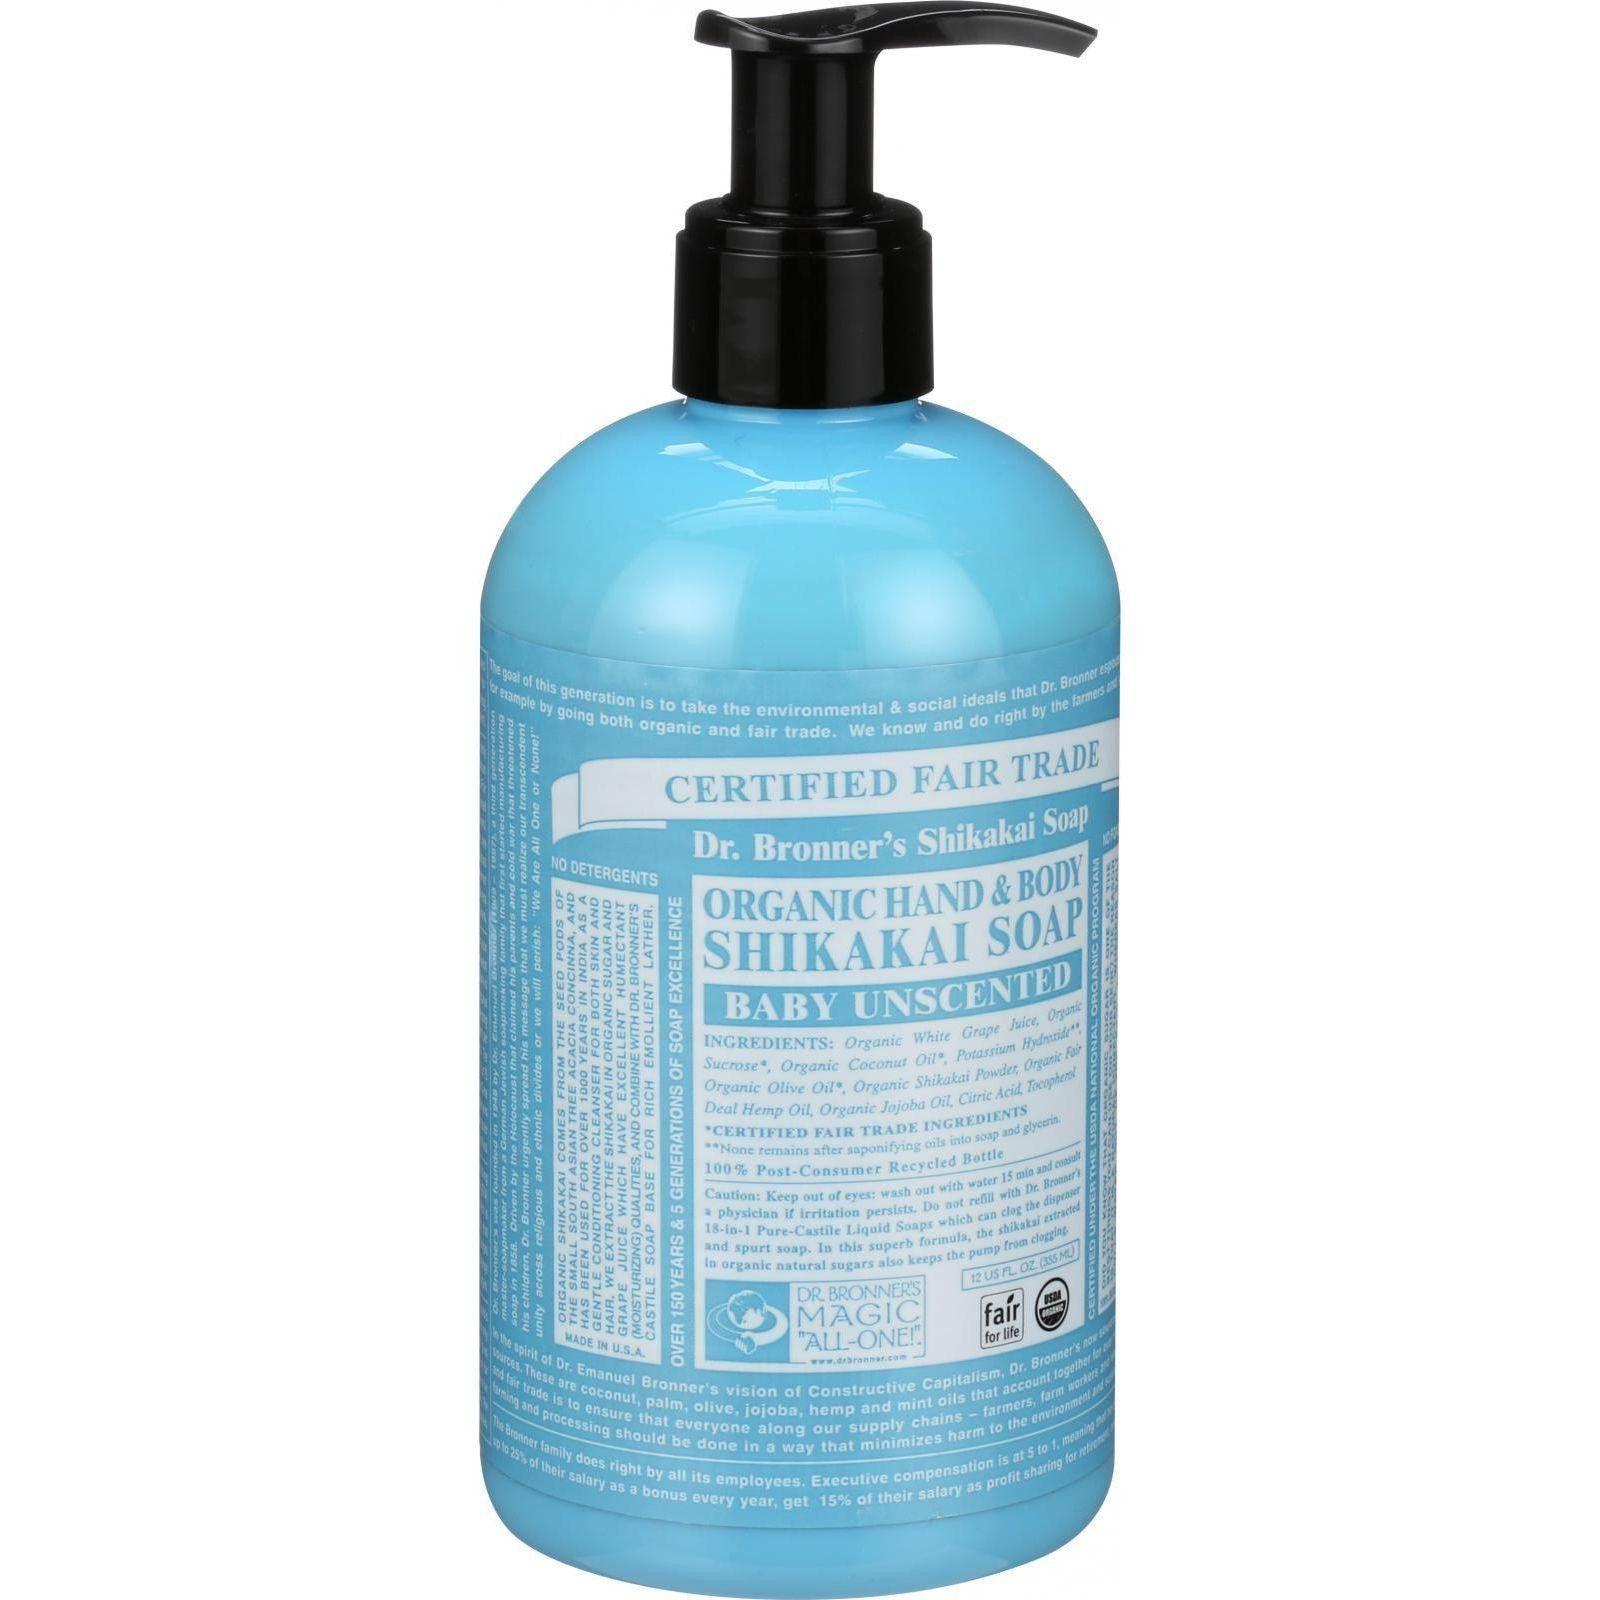 Dr. Bronner's Fair Trade And Organic Shikakai Soap Hand